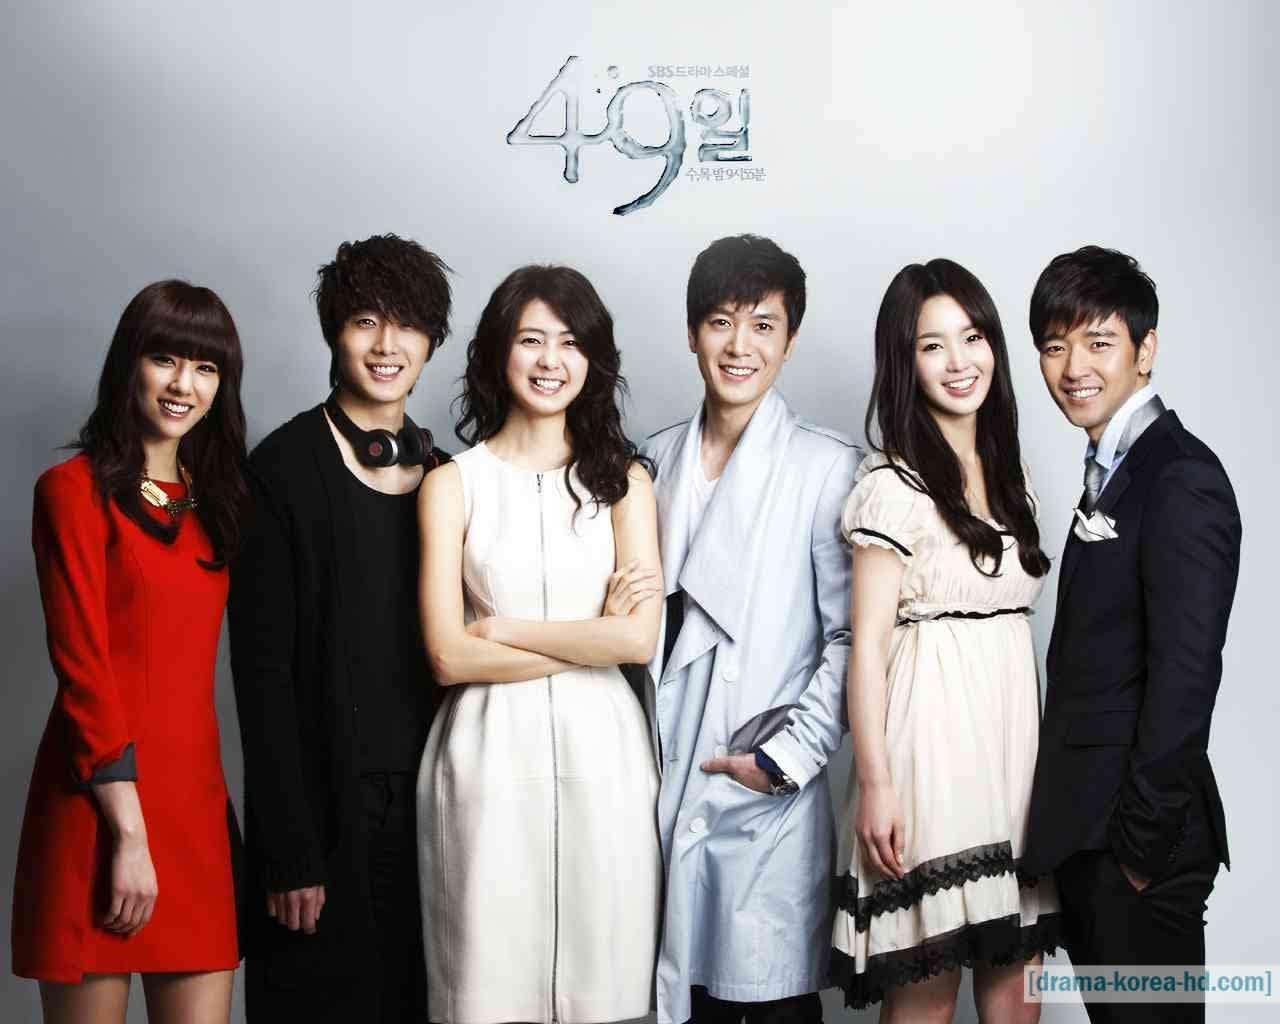 49 Days - Complete Episode drama korea